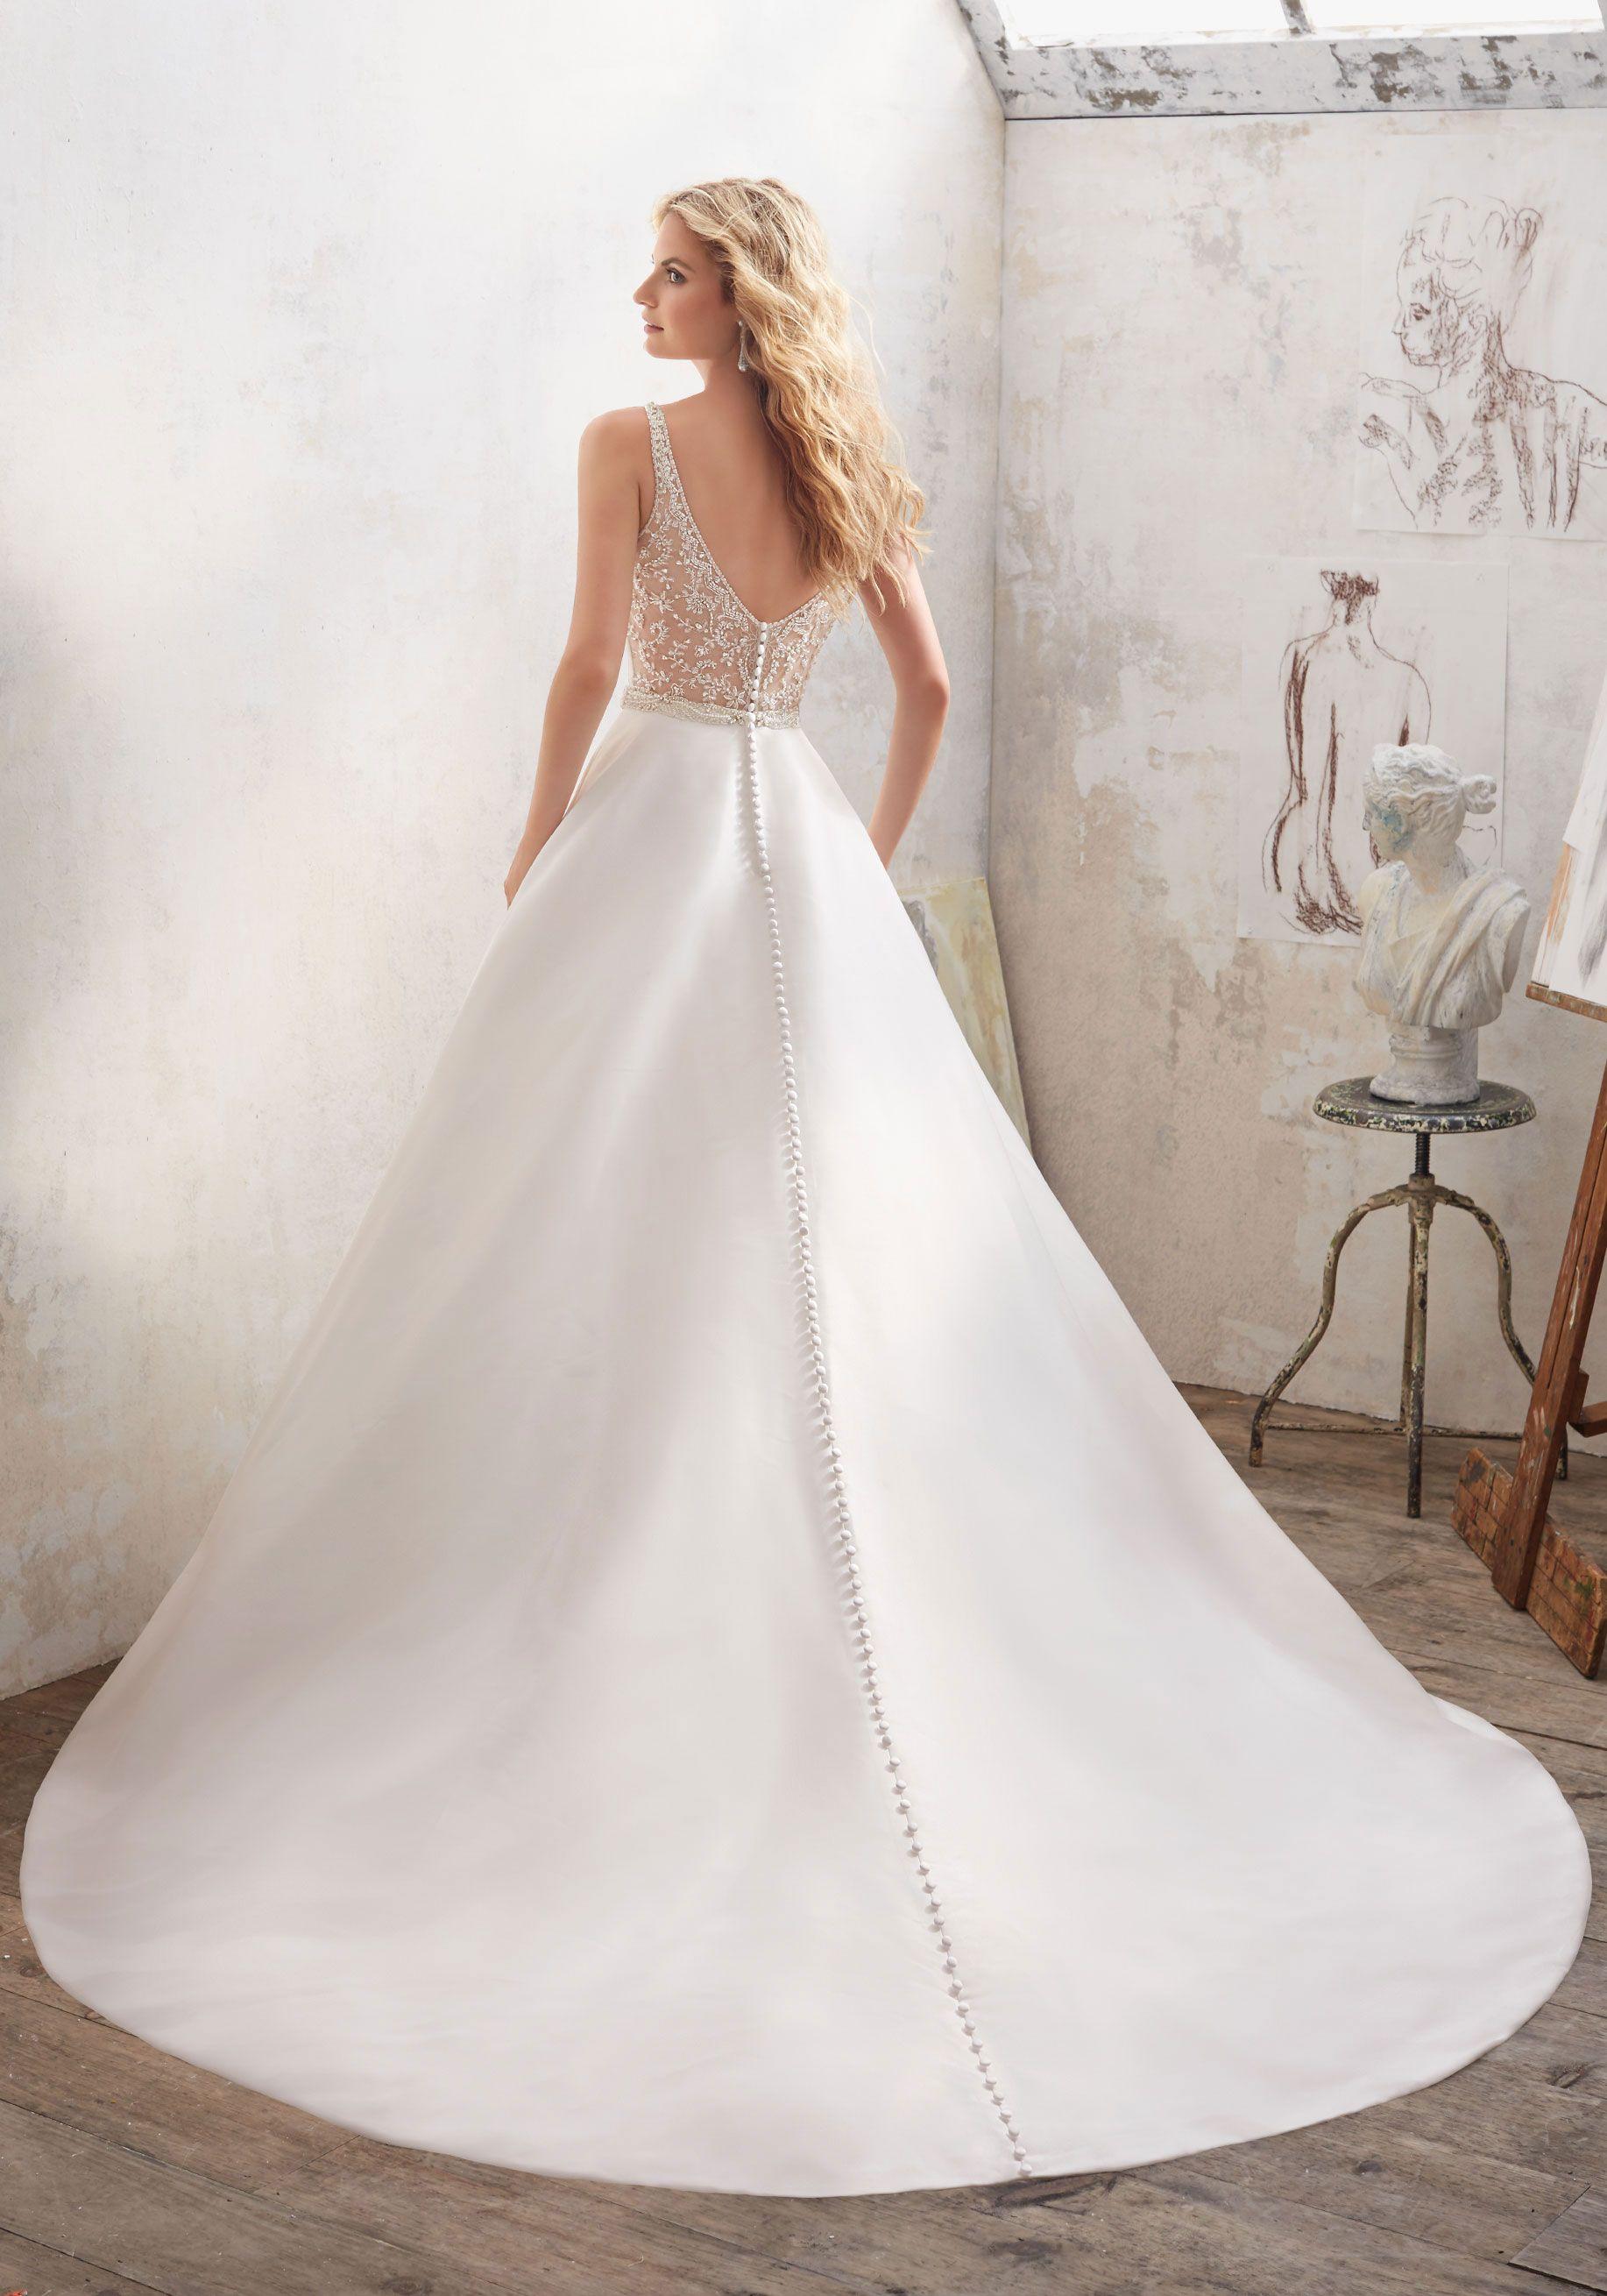 Mori Lee 8123 B Mori Lee Wedding Dress A Line Wedding Dress Wedding Dresses Satin